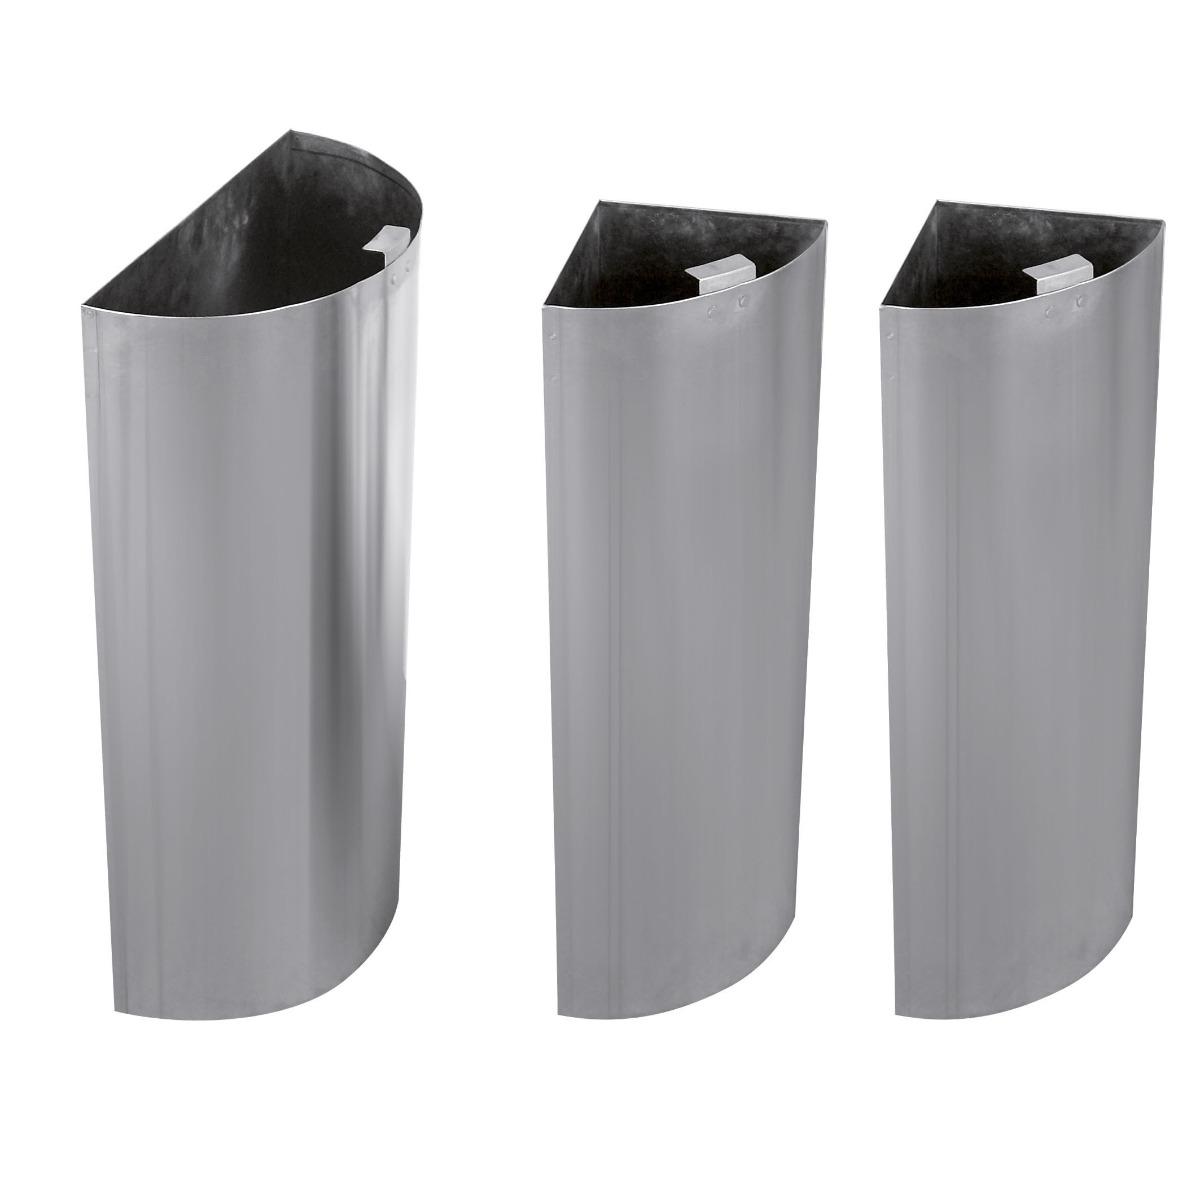 Waste Separation Bin